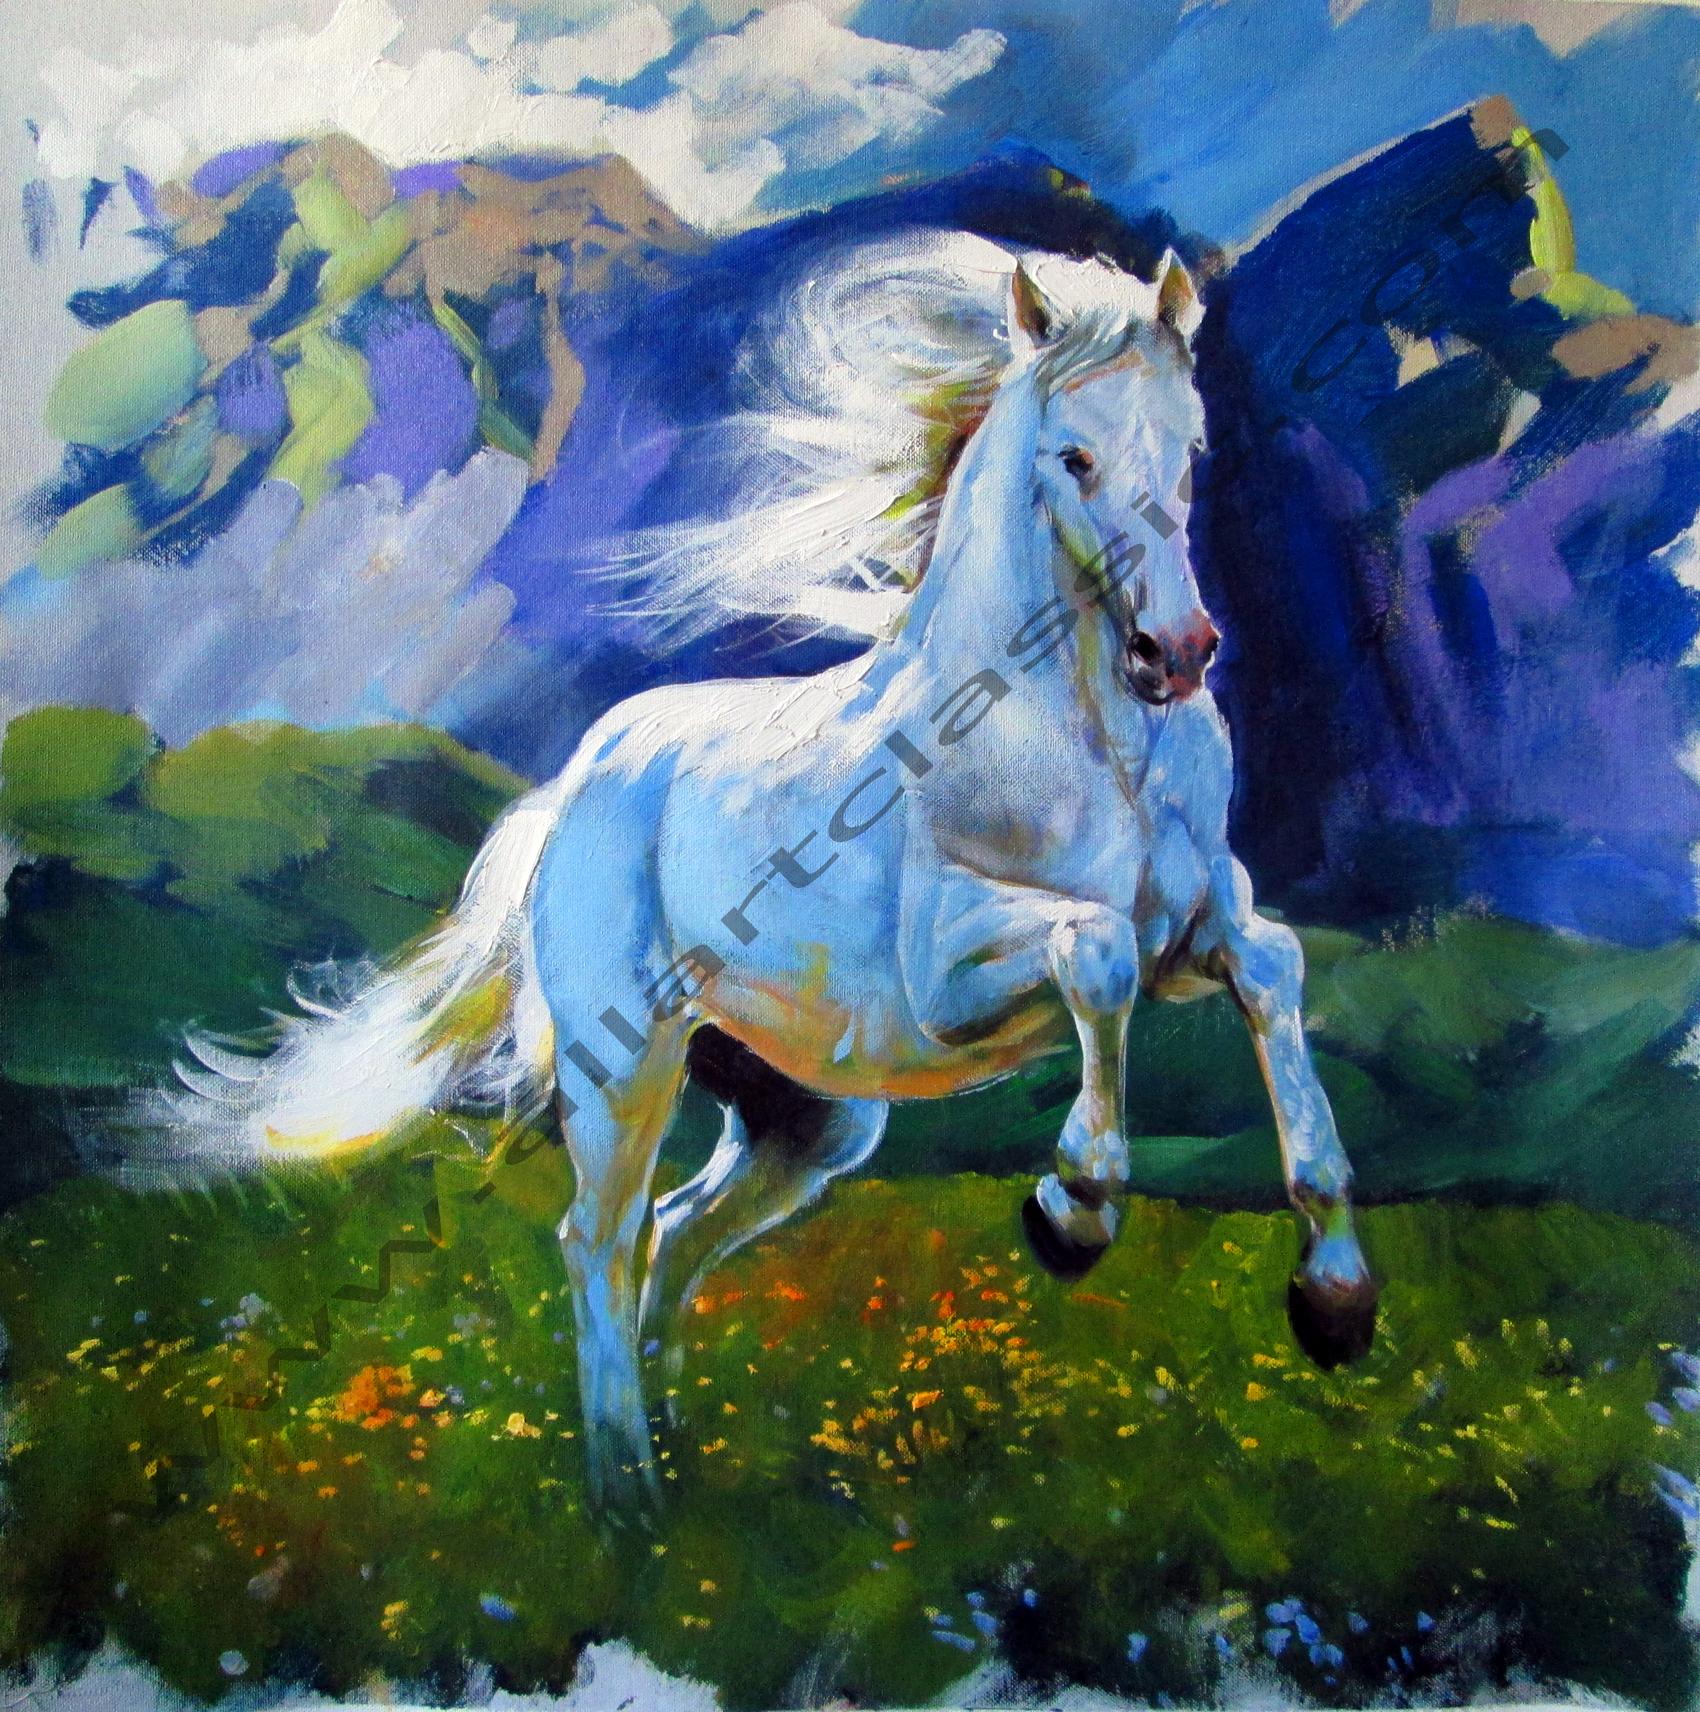 Home Interiors Painting Of Three Horses Heads